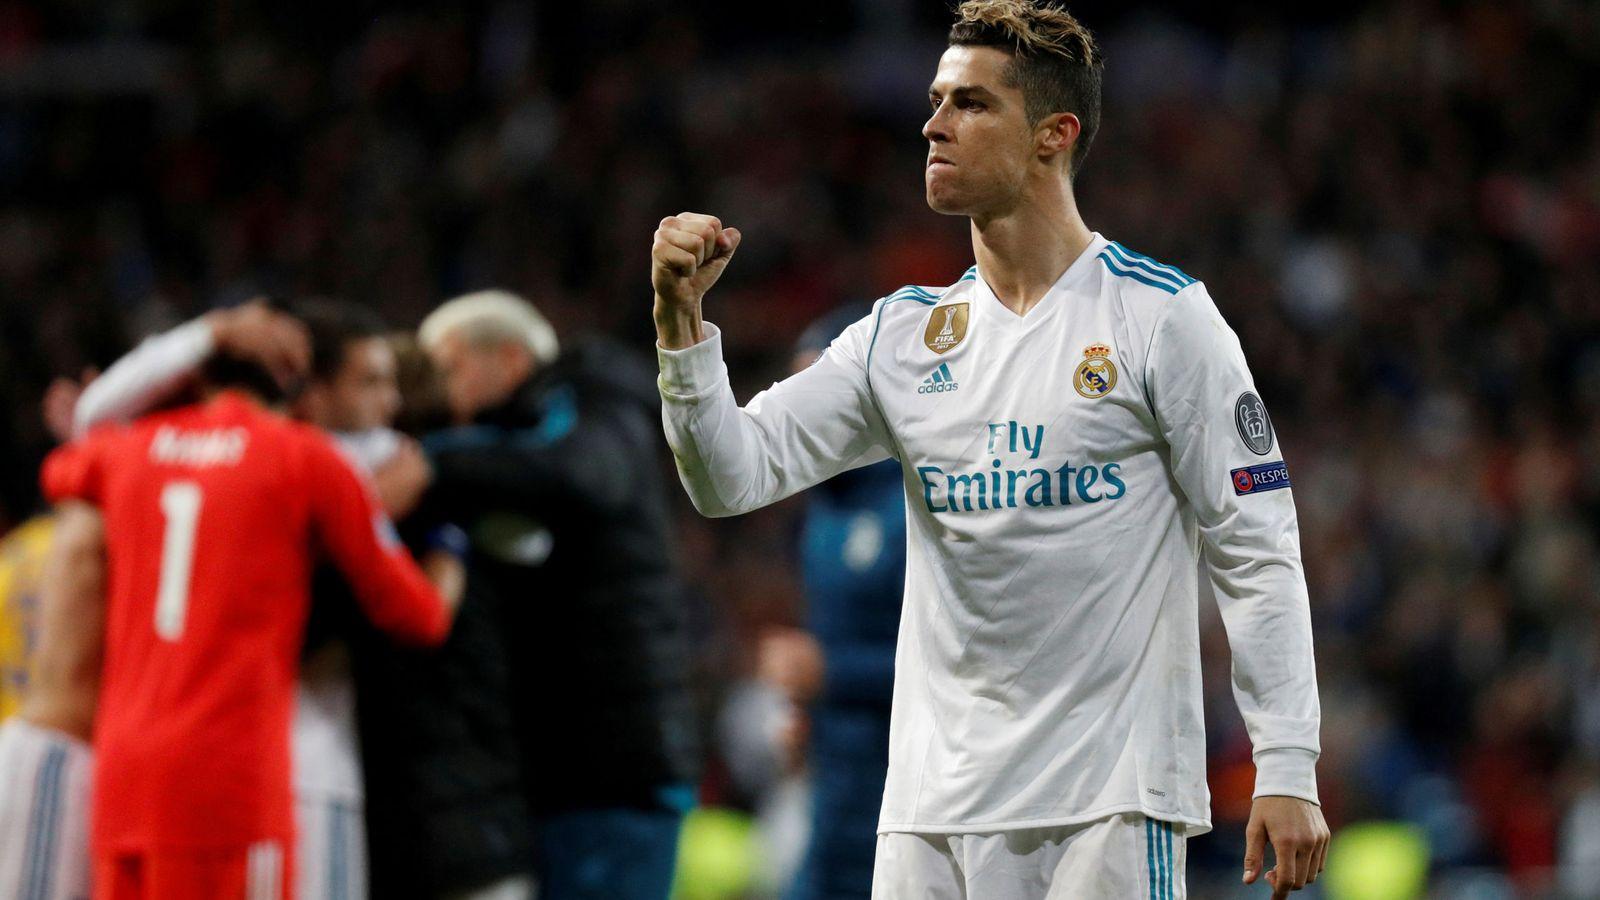 b3b83a269e794 Cristiano Ronaldo se va del Real Madrid a la Juventus por 100 millones de  euros